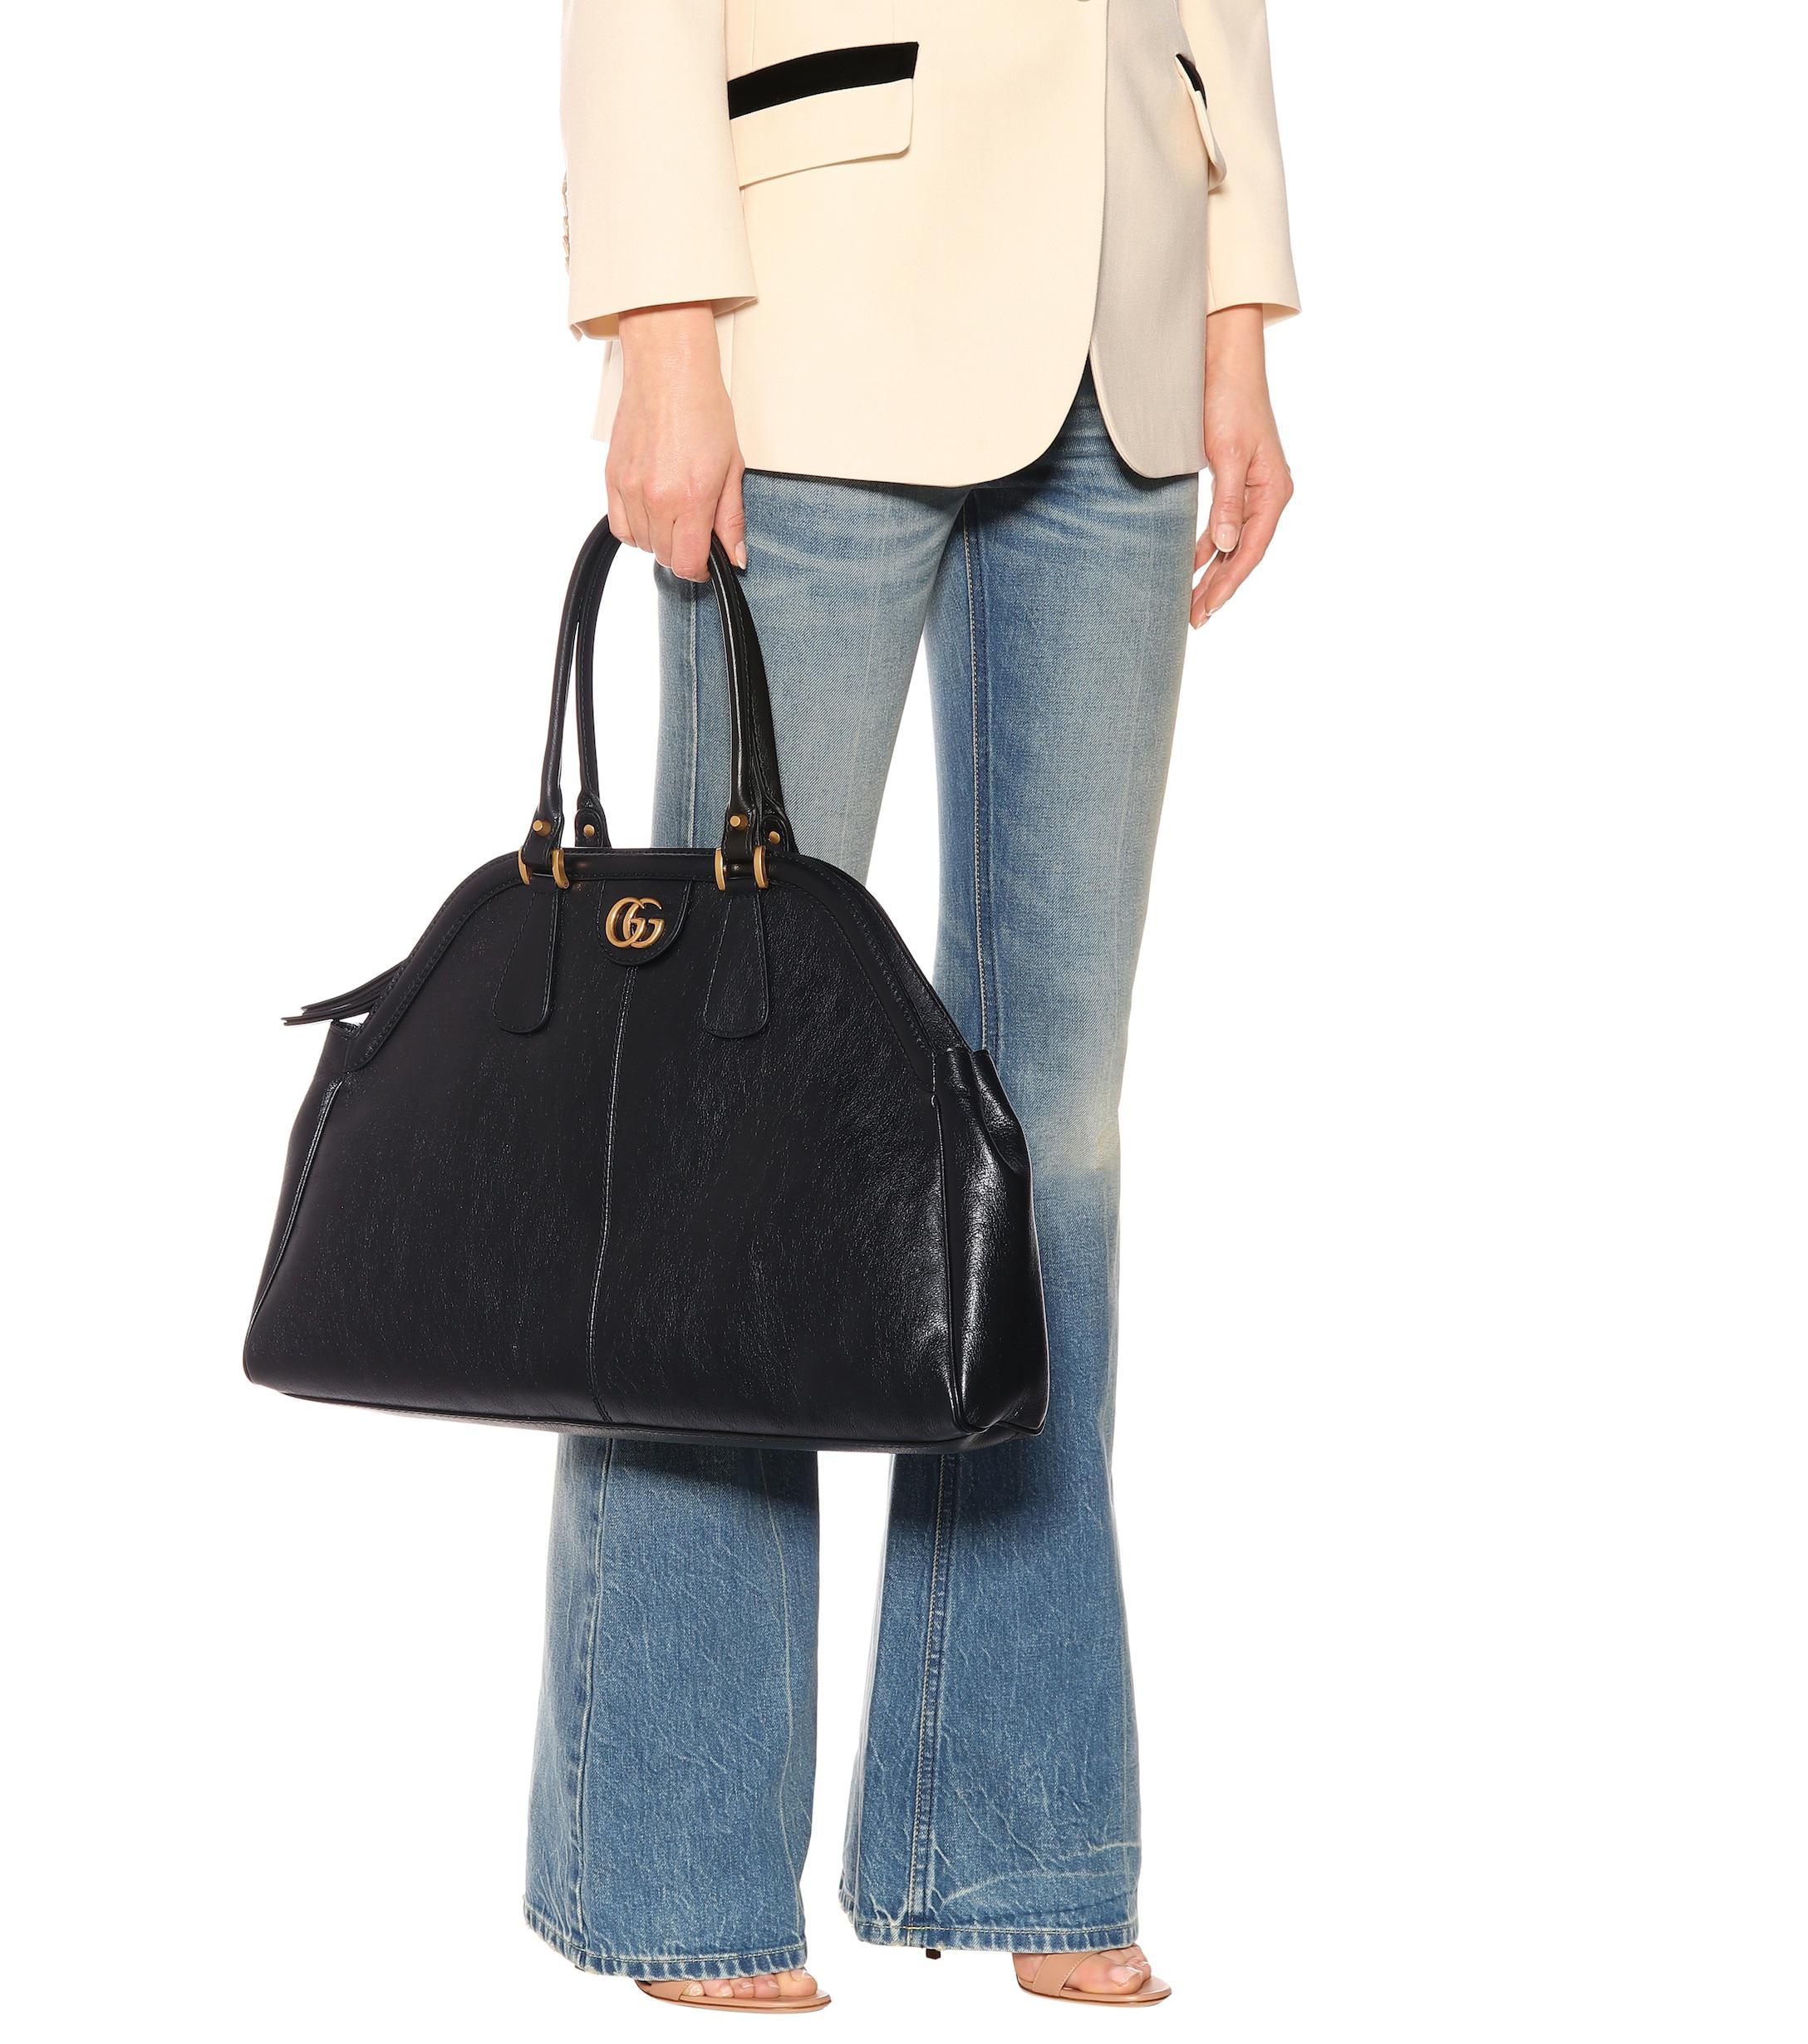 0d12154b00d Gucci - Black Re(belle) Large Leather Shoulder Bag - Lyst. View fullscreen